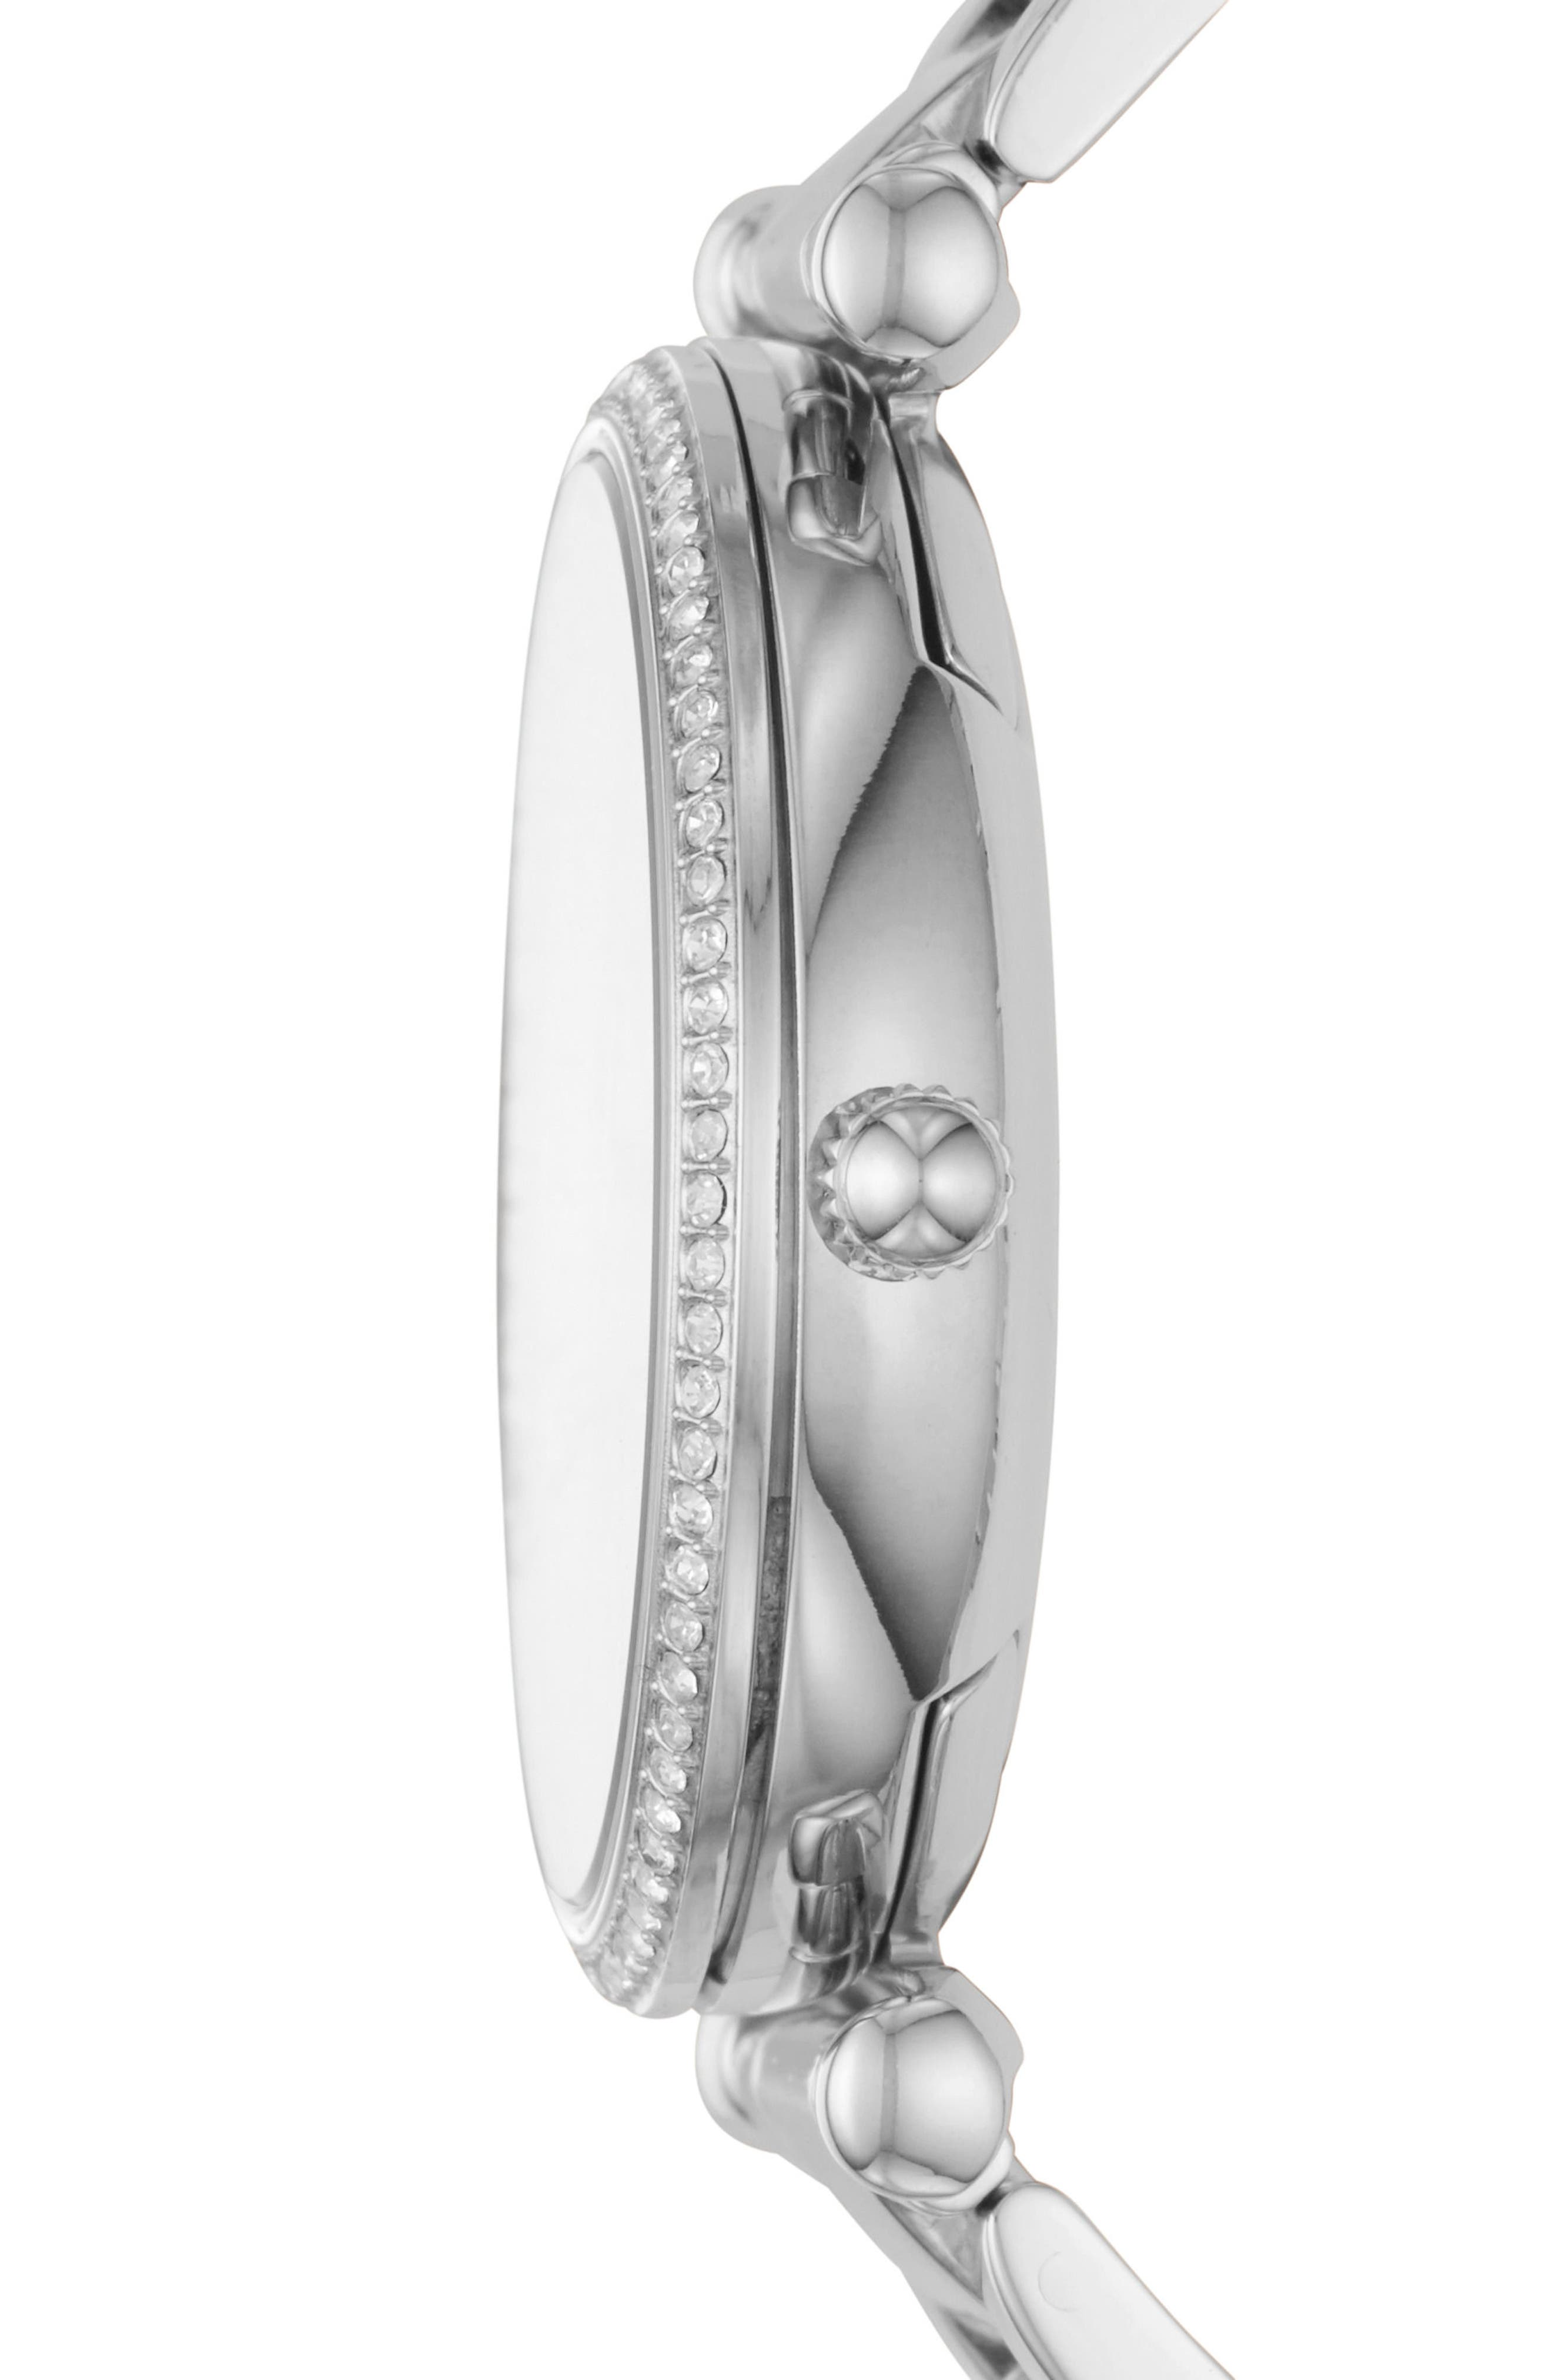 FOSSIL, Carlie T-Bar Crystal Bracelet Watch, 35mm, Alternate thumbnail 2, color, SILVER